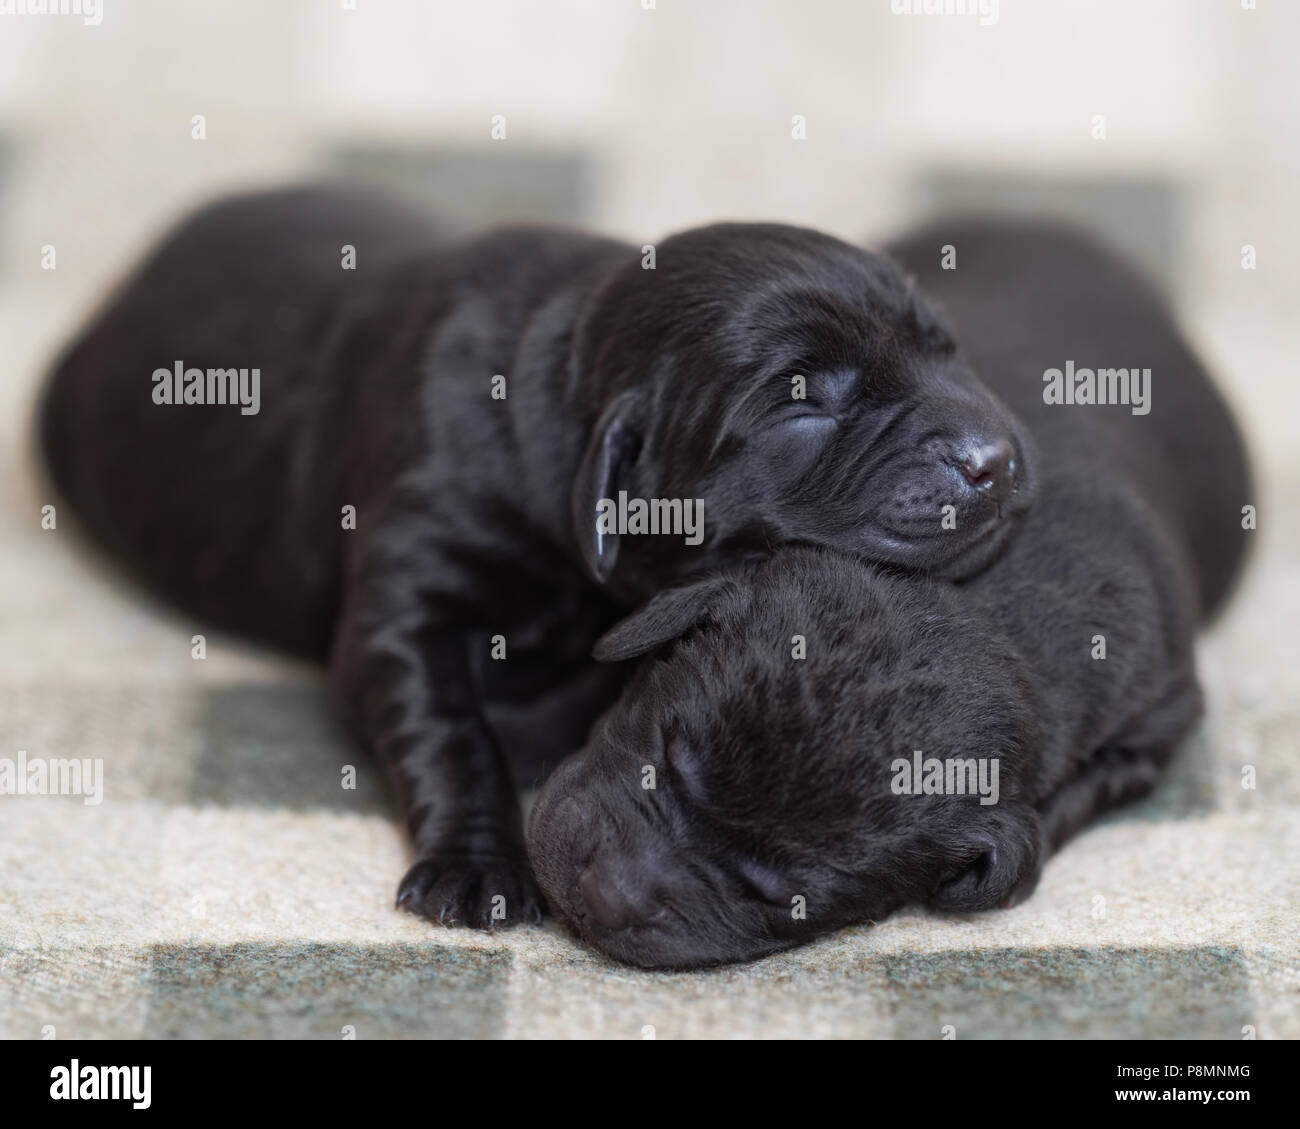 Newborn Cute Black Labrador Puppies Stock Photo Alamy